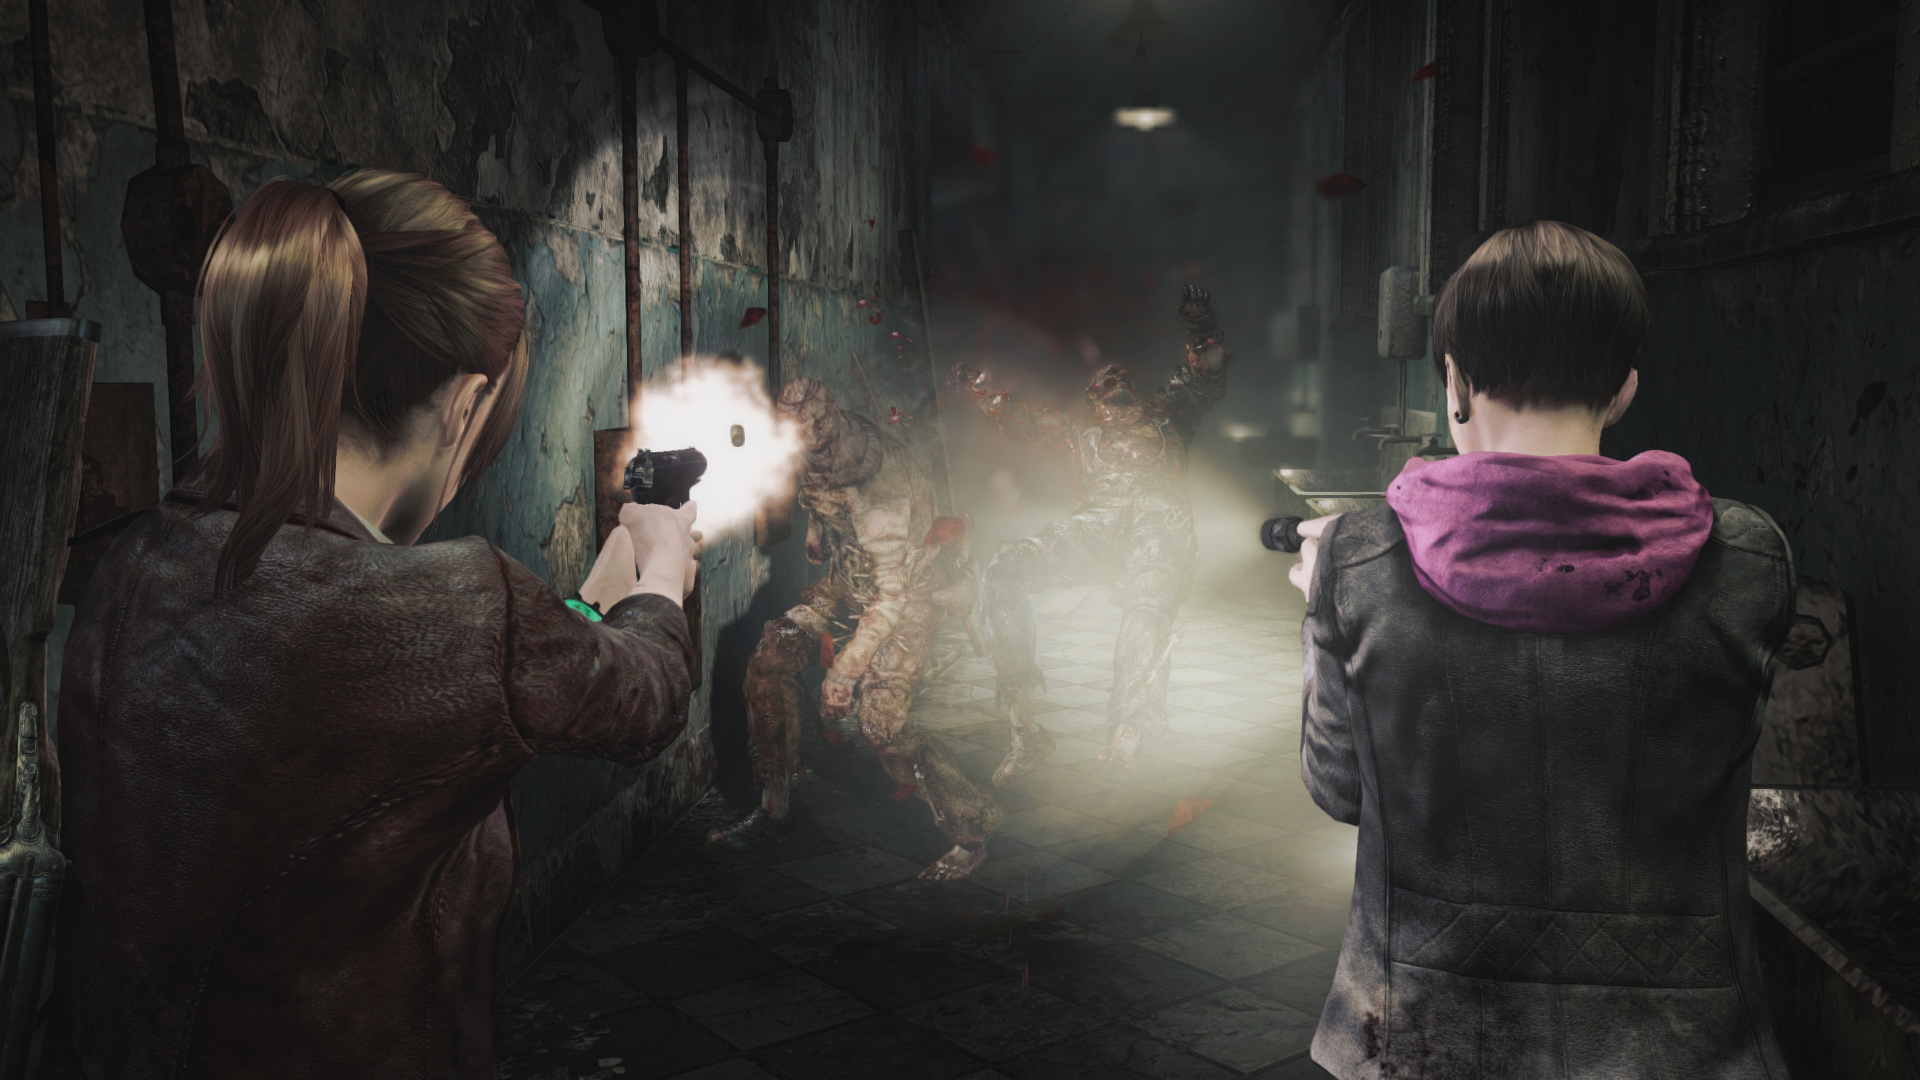 Resident Evil Revelations 2 / Biohazard Revelations 2 Ss_2ba8c62586daf4cdd750aba8dc936cee01f2bef9